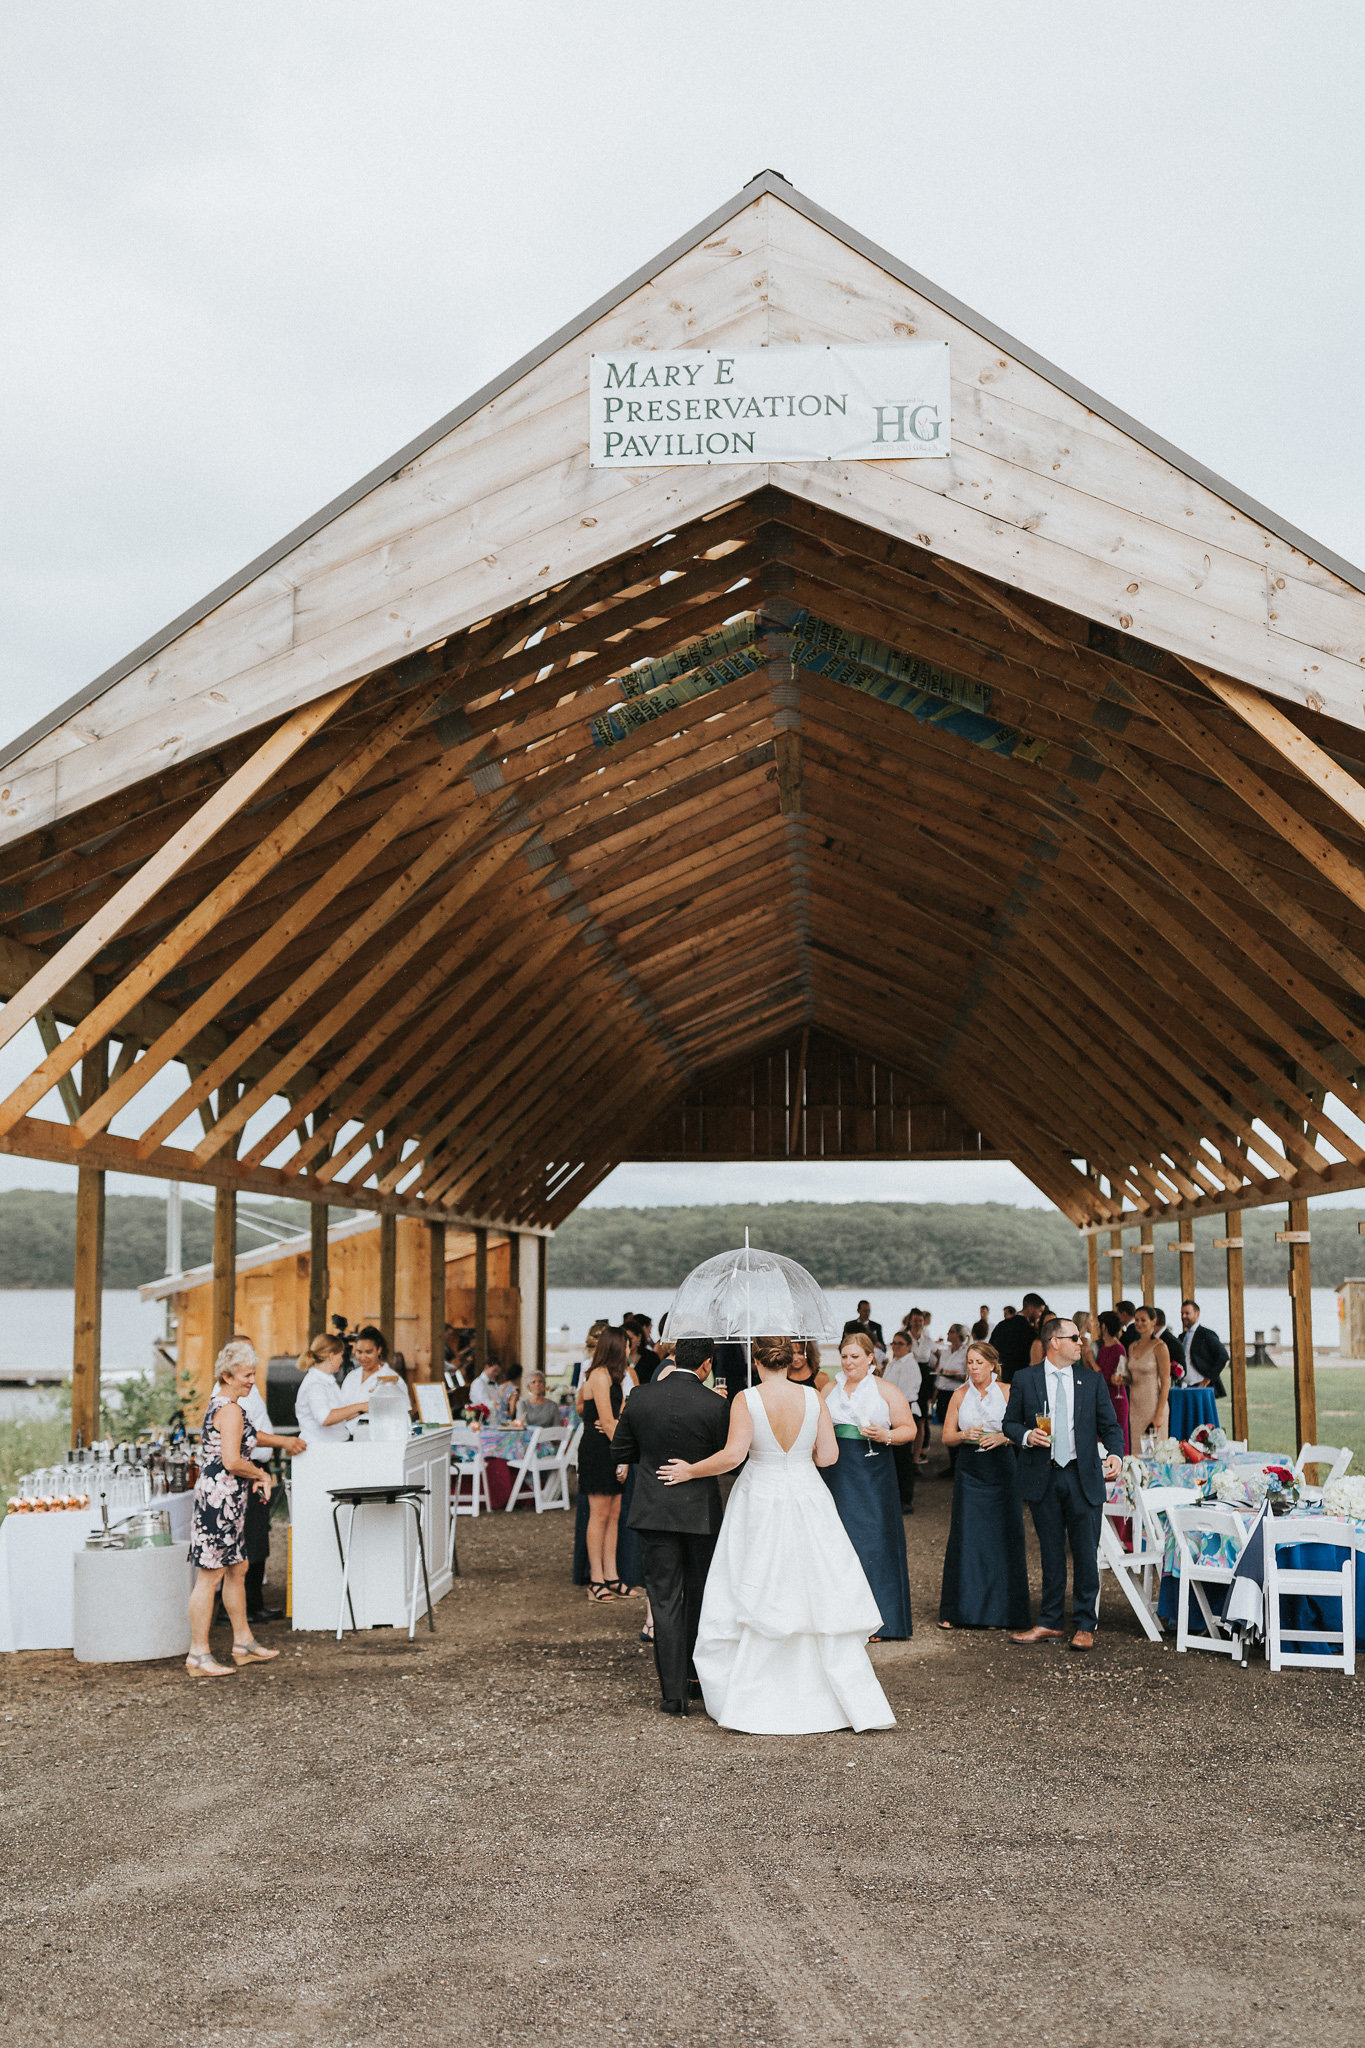 Maine Maritime Wedding_080418_150.jpg